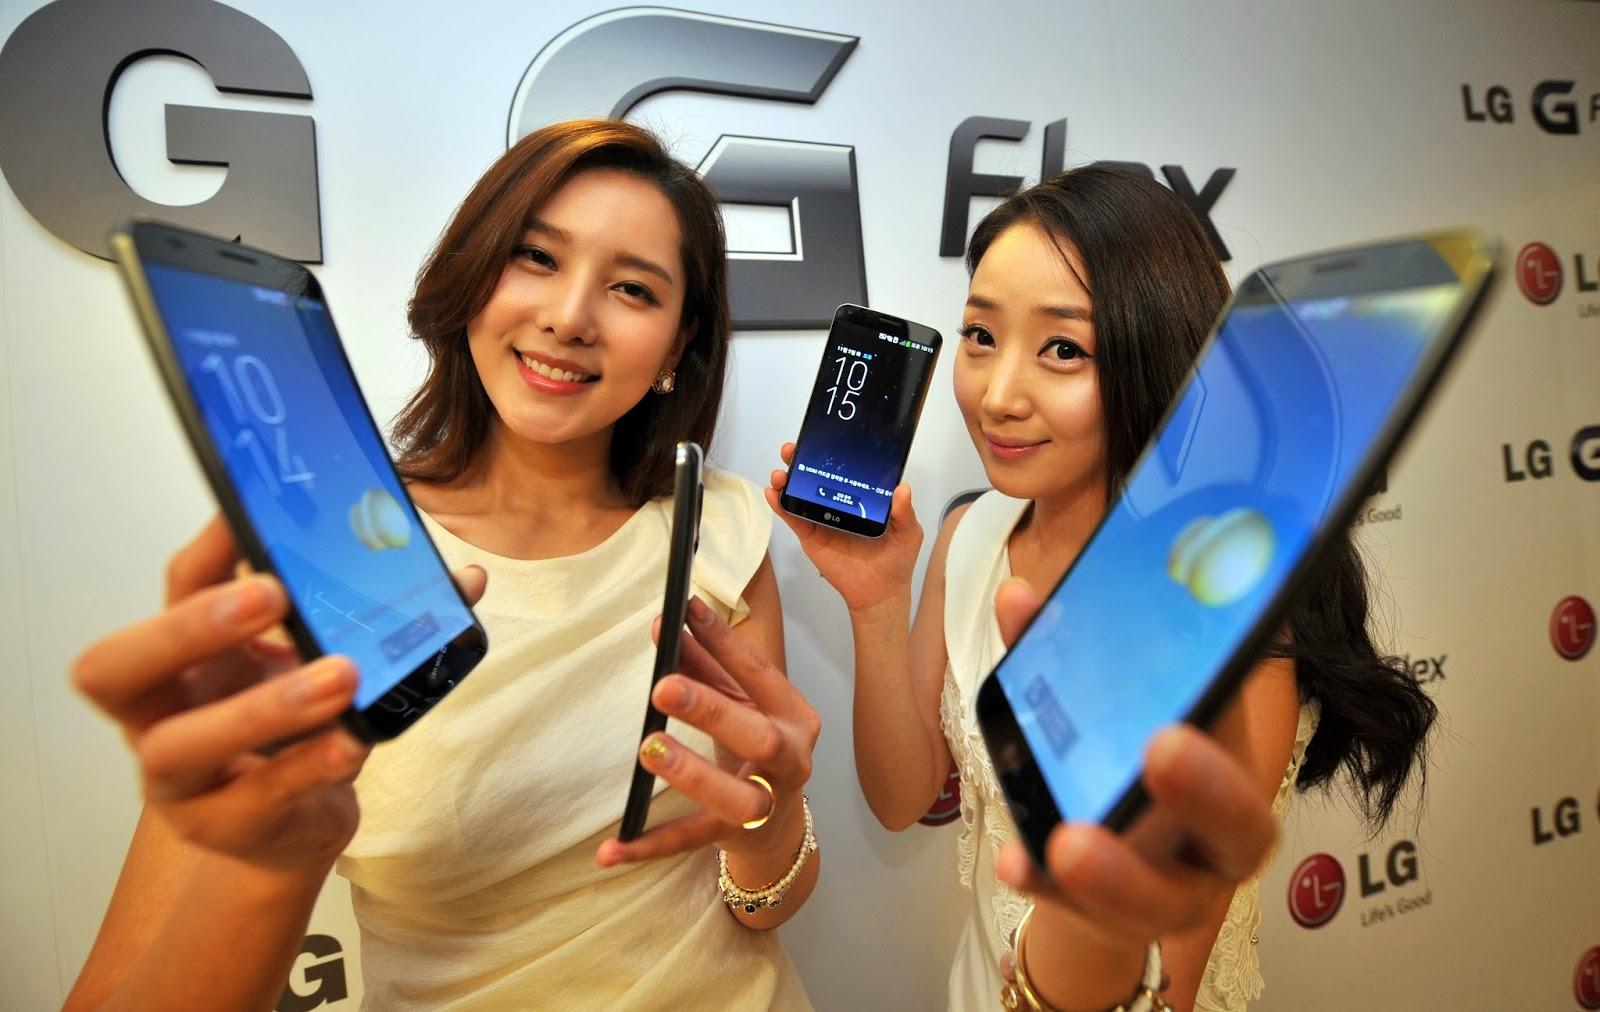 LG, Smartphone, Phone, Technology, Telecom, Korea, Flex, 2014, Flex, Curved Display Screen, Mobile, Business, Economy,